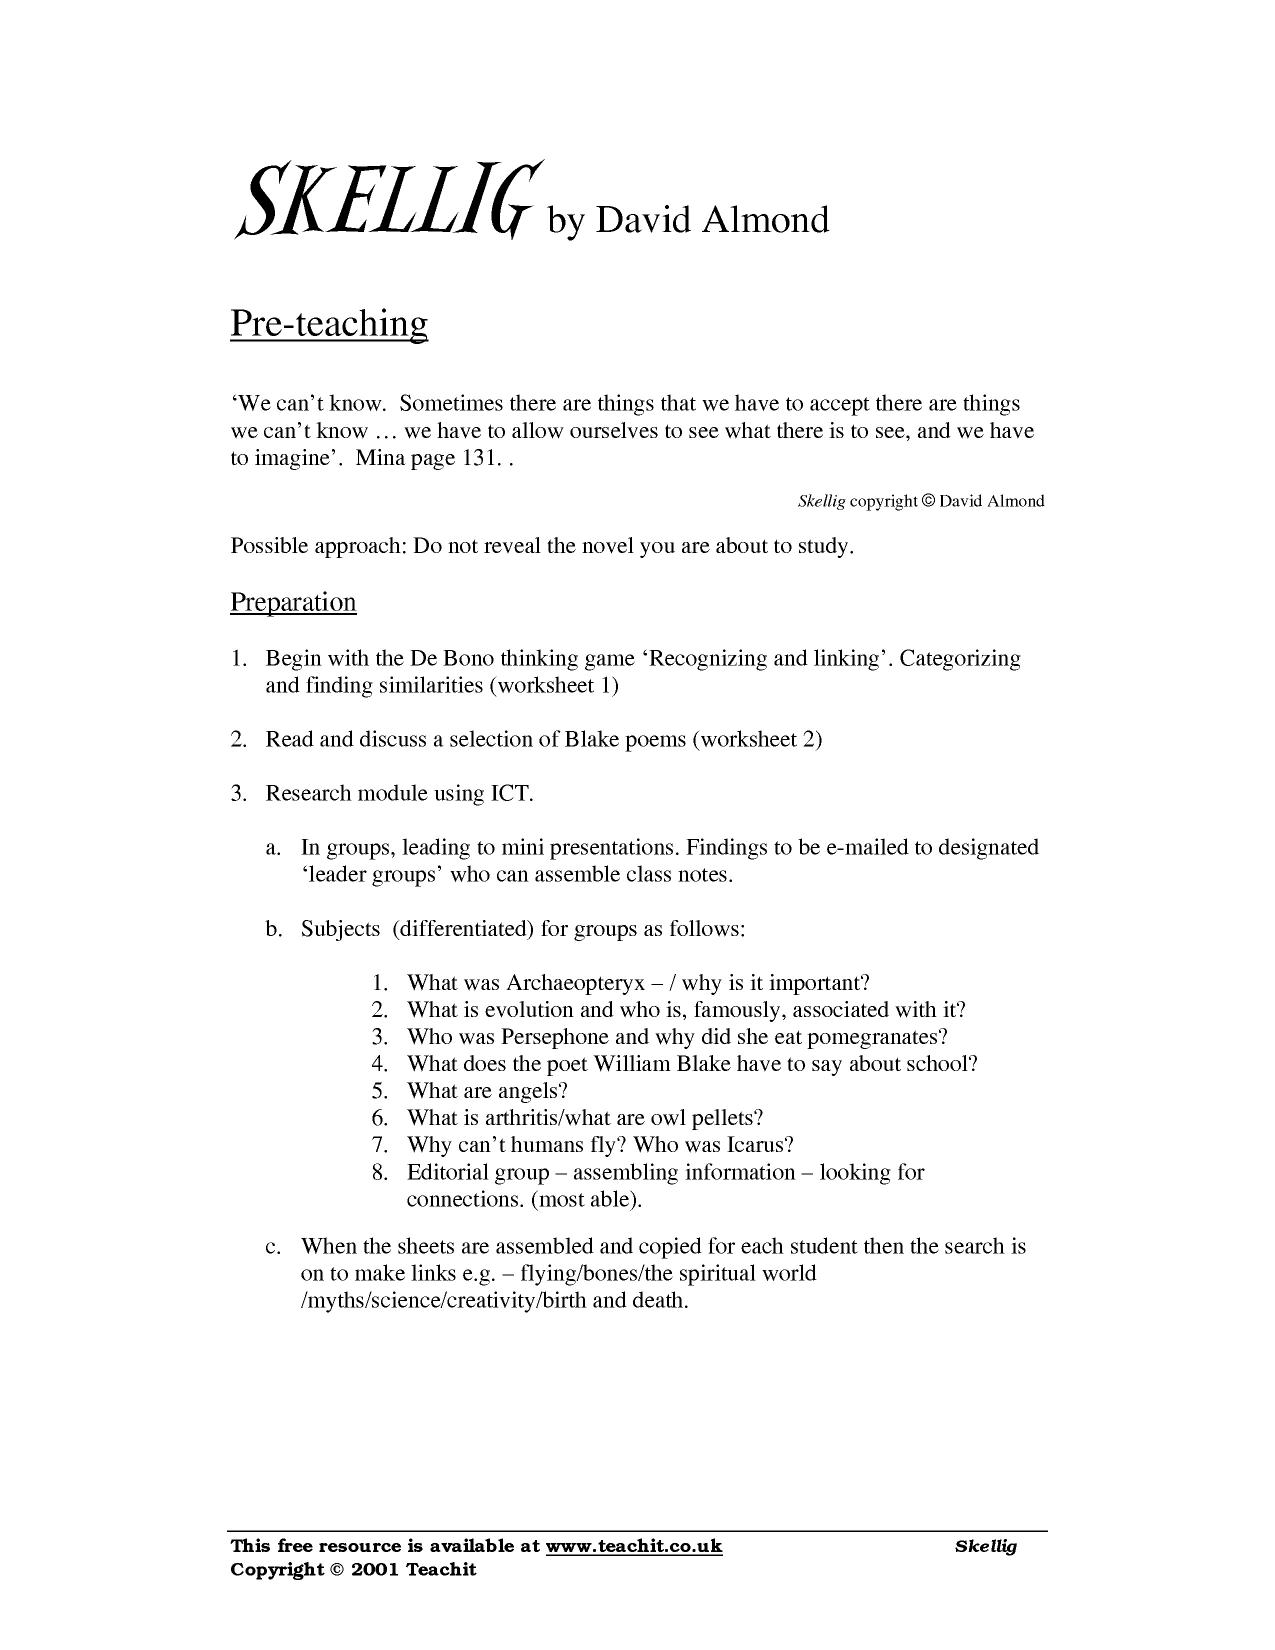 essay on skellig by david almond